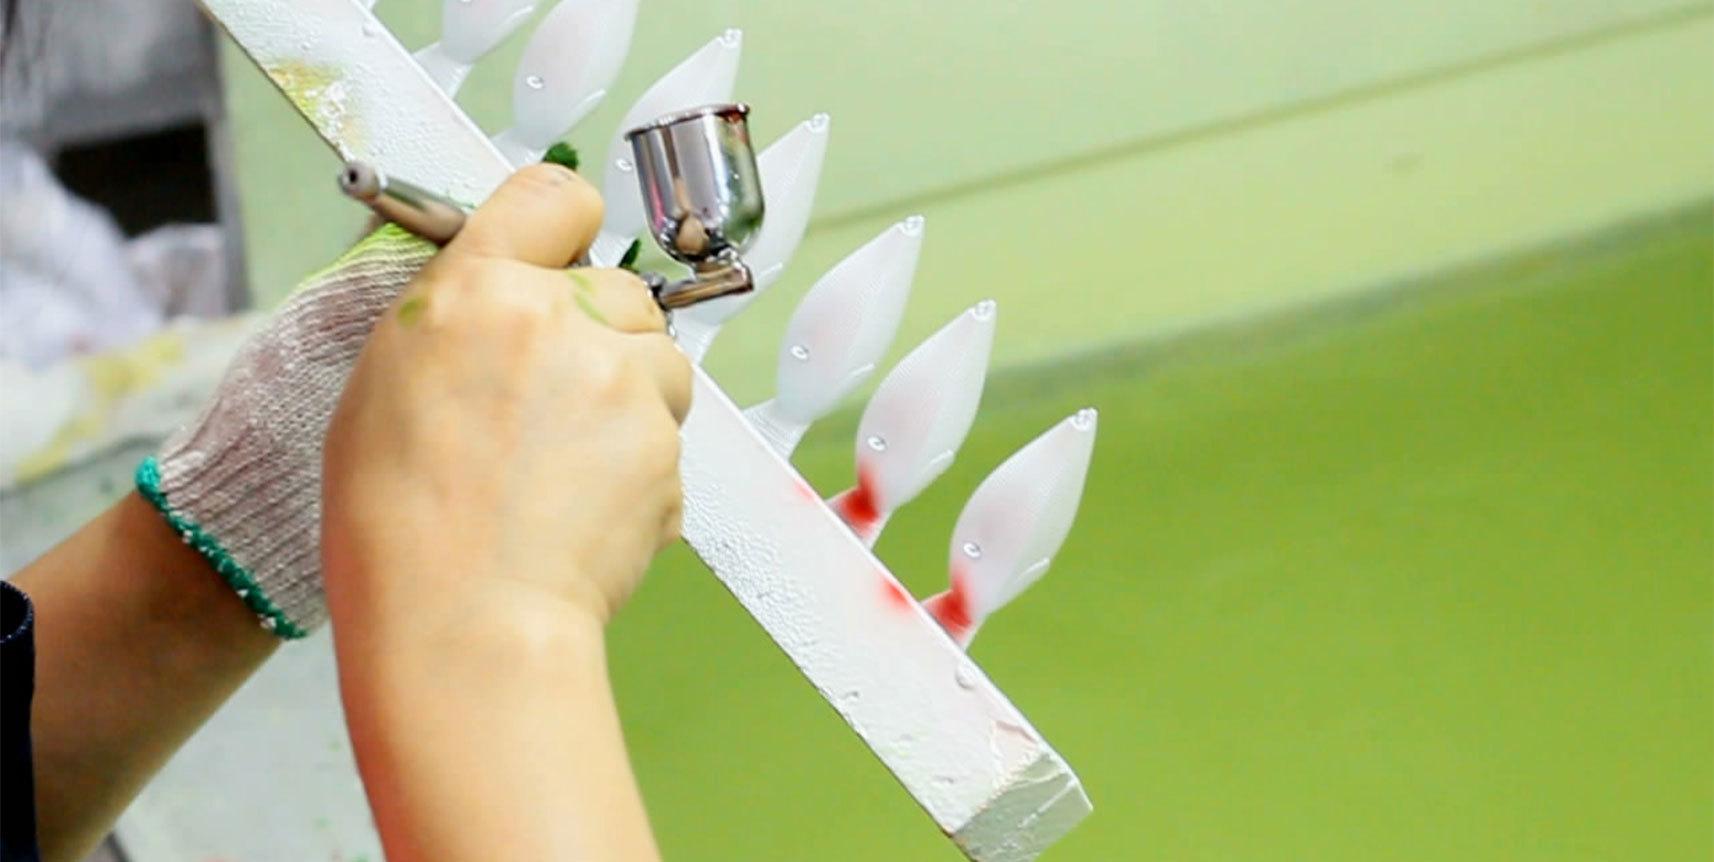 3. Painting Process